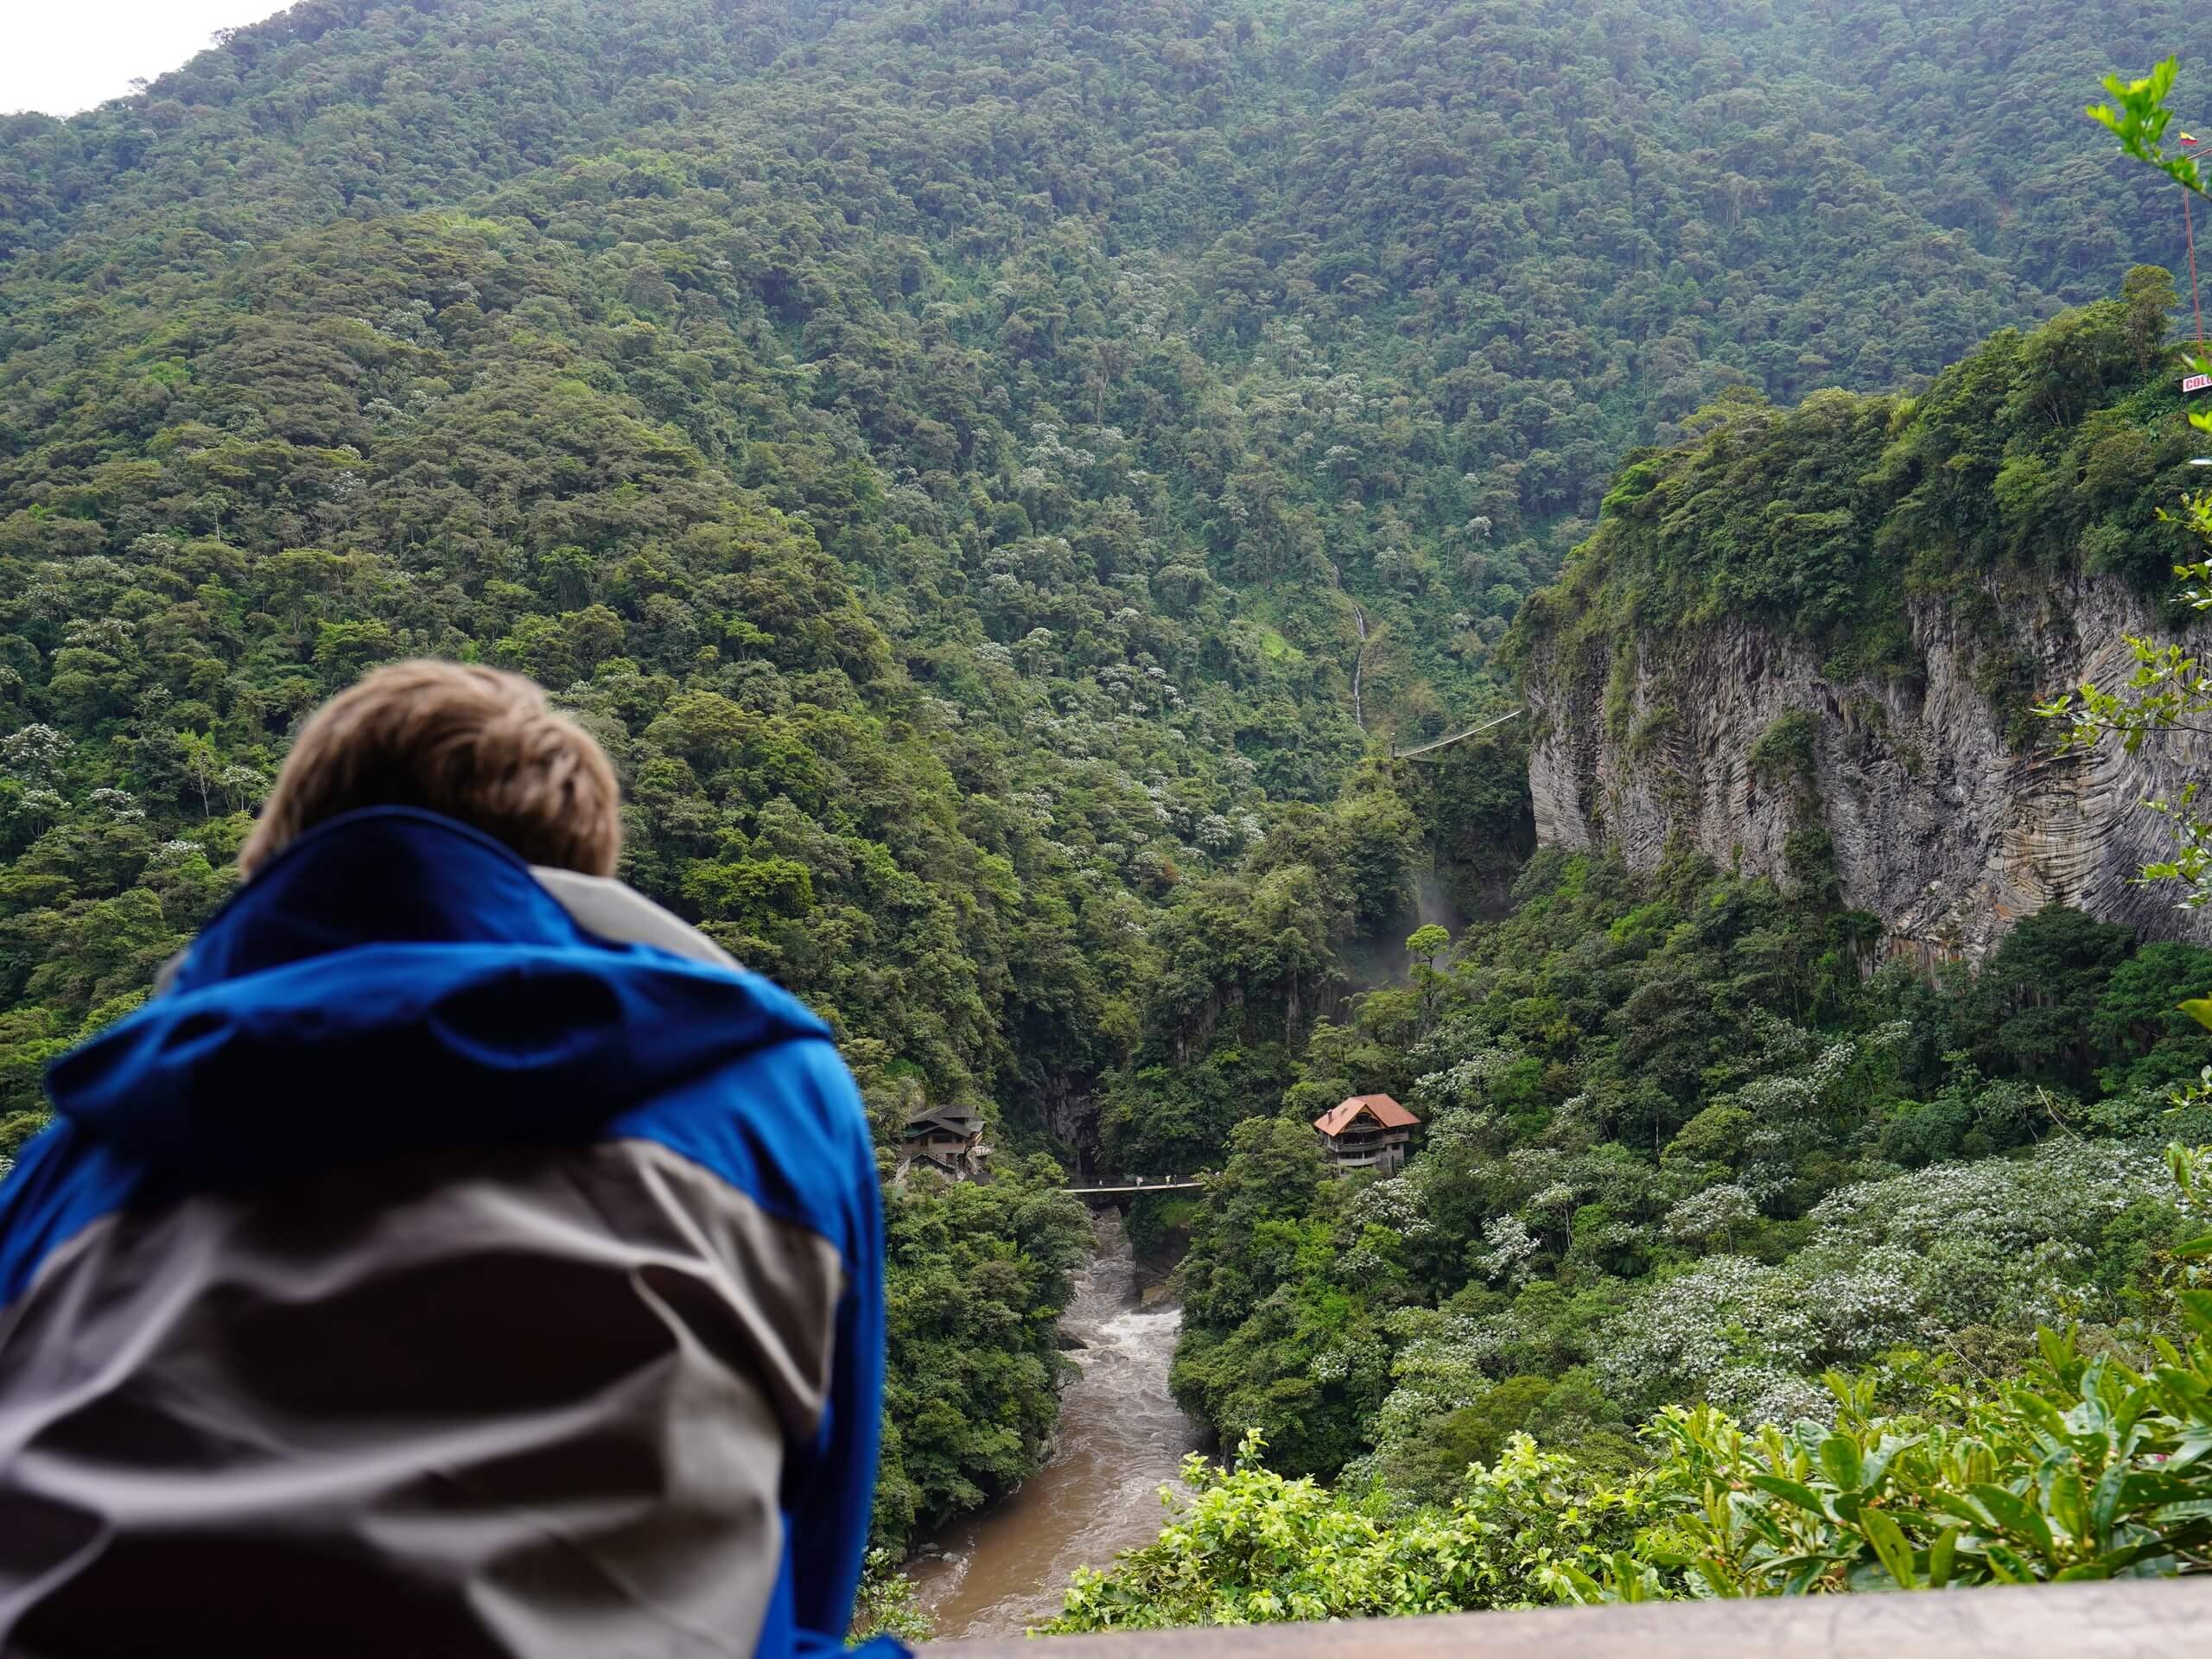 Resting spot along the Amazon Rainforest biking route